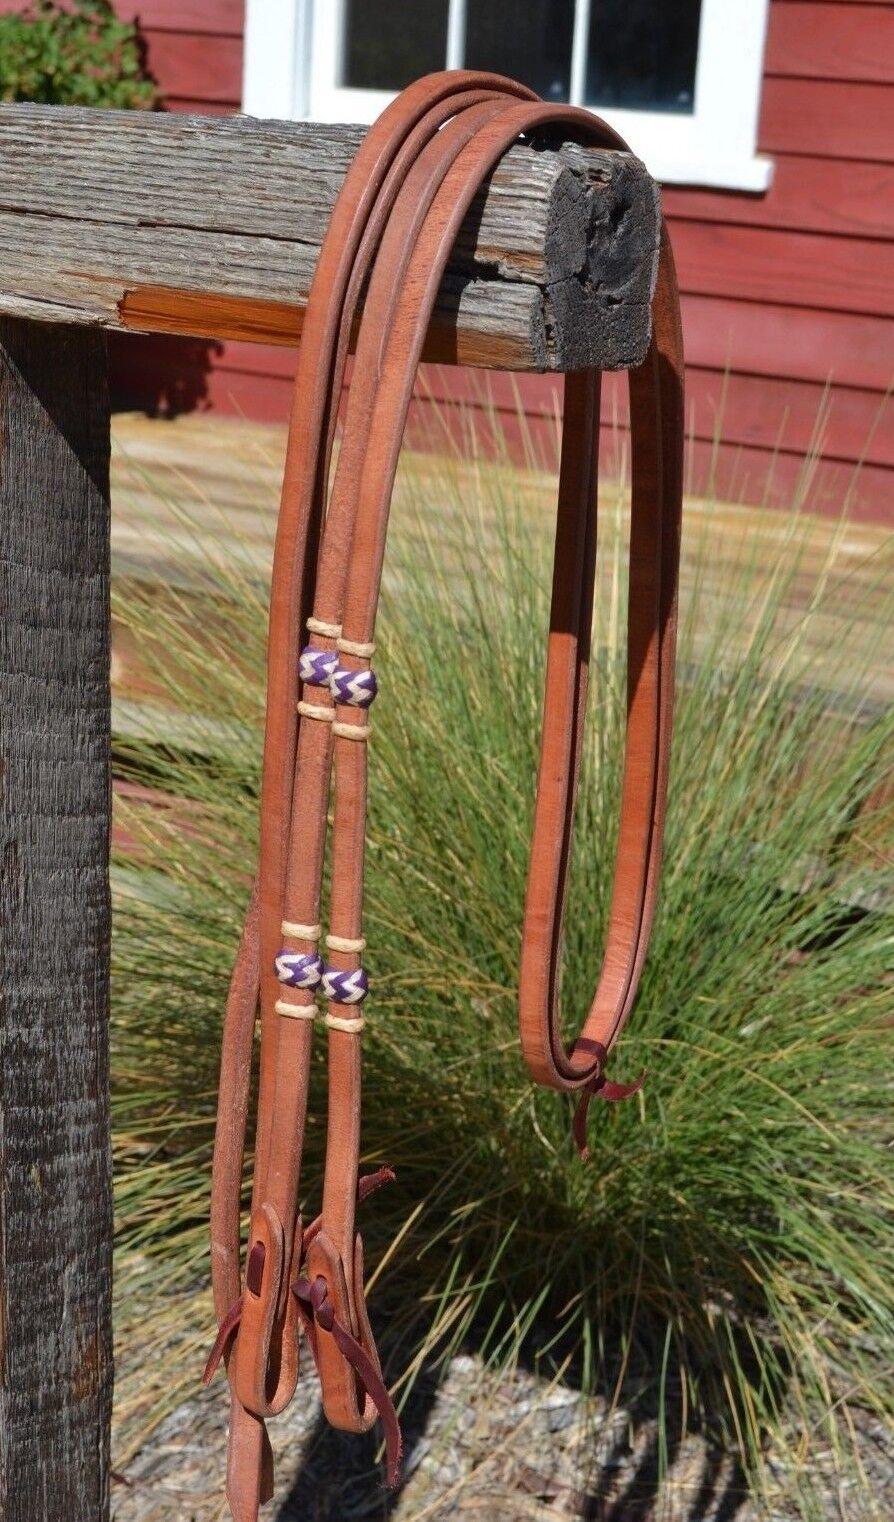 5 8  José Ortiz Arnés Split riendas trenzado cuero crudo natural púrpura nudos - 8 ft.